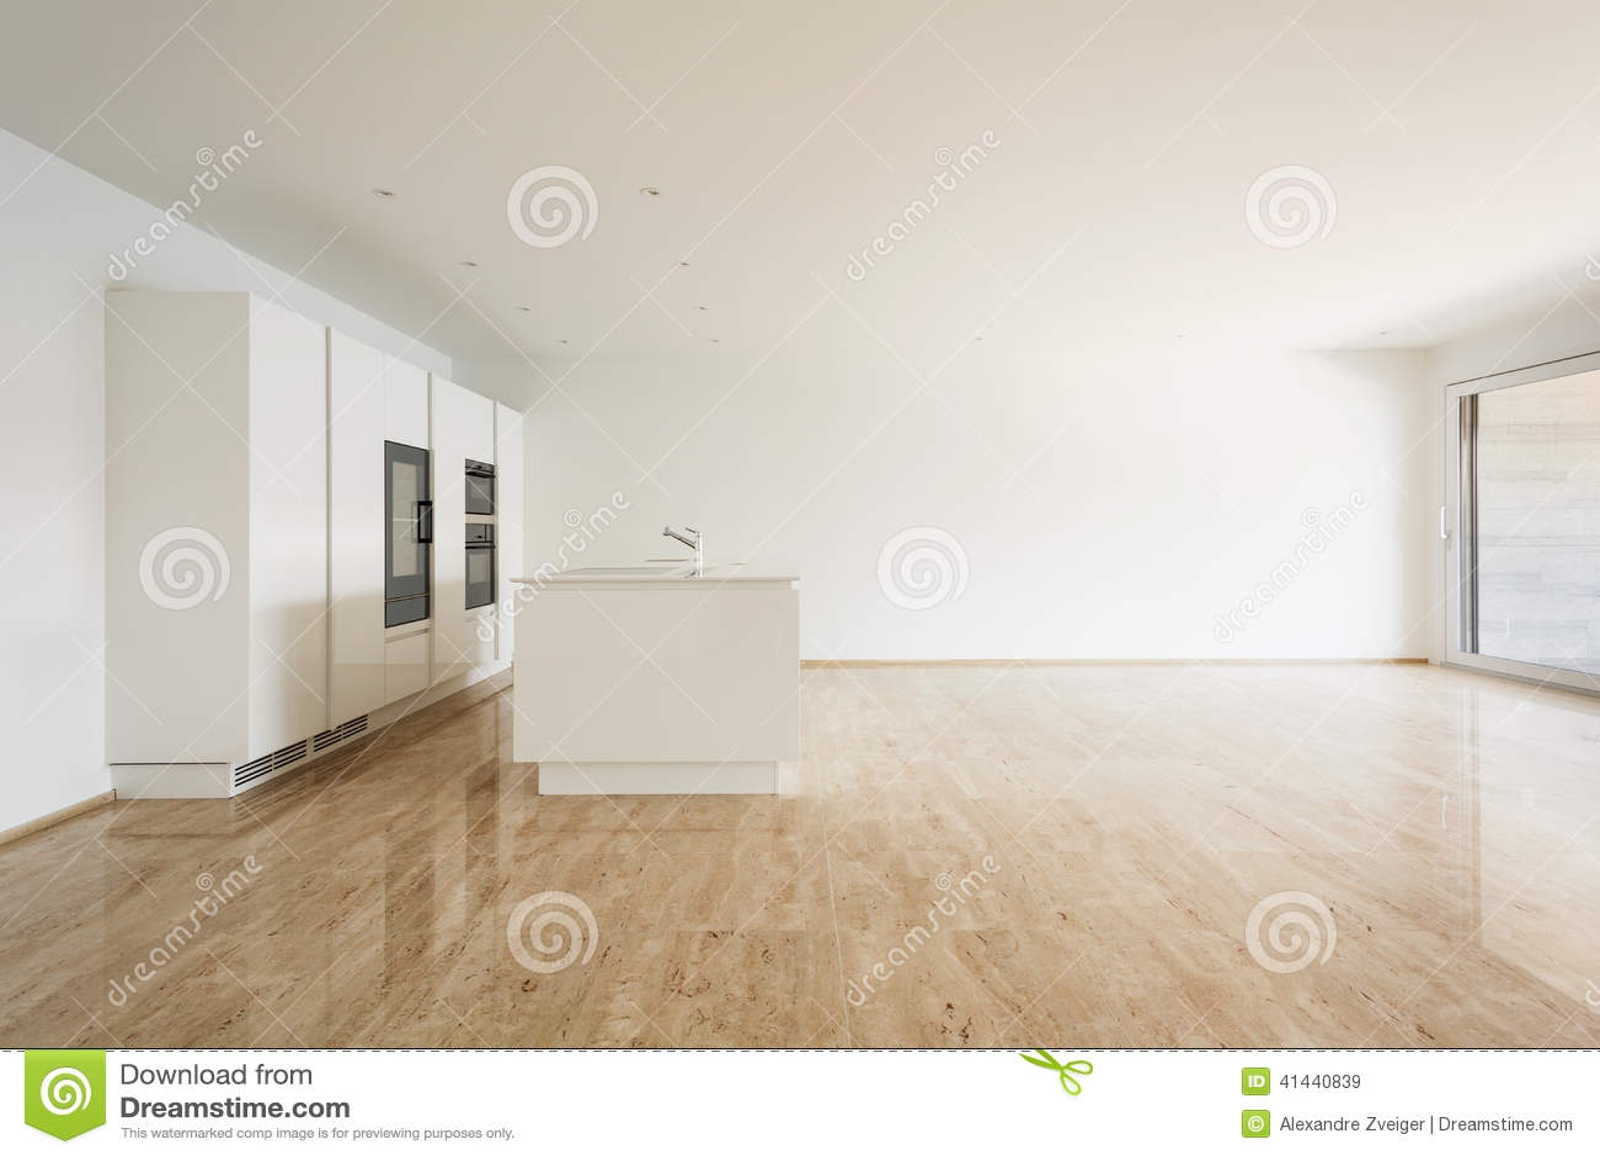 Mooie Witte Keuken : Mooie lege flat witte keuken stock afbeelding afbeelding